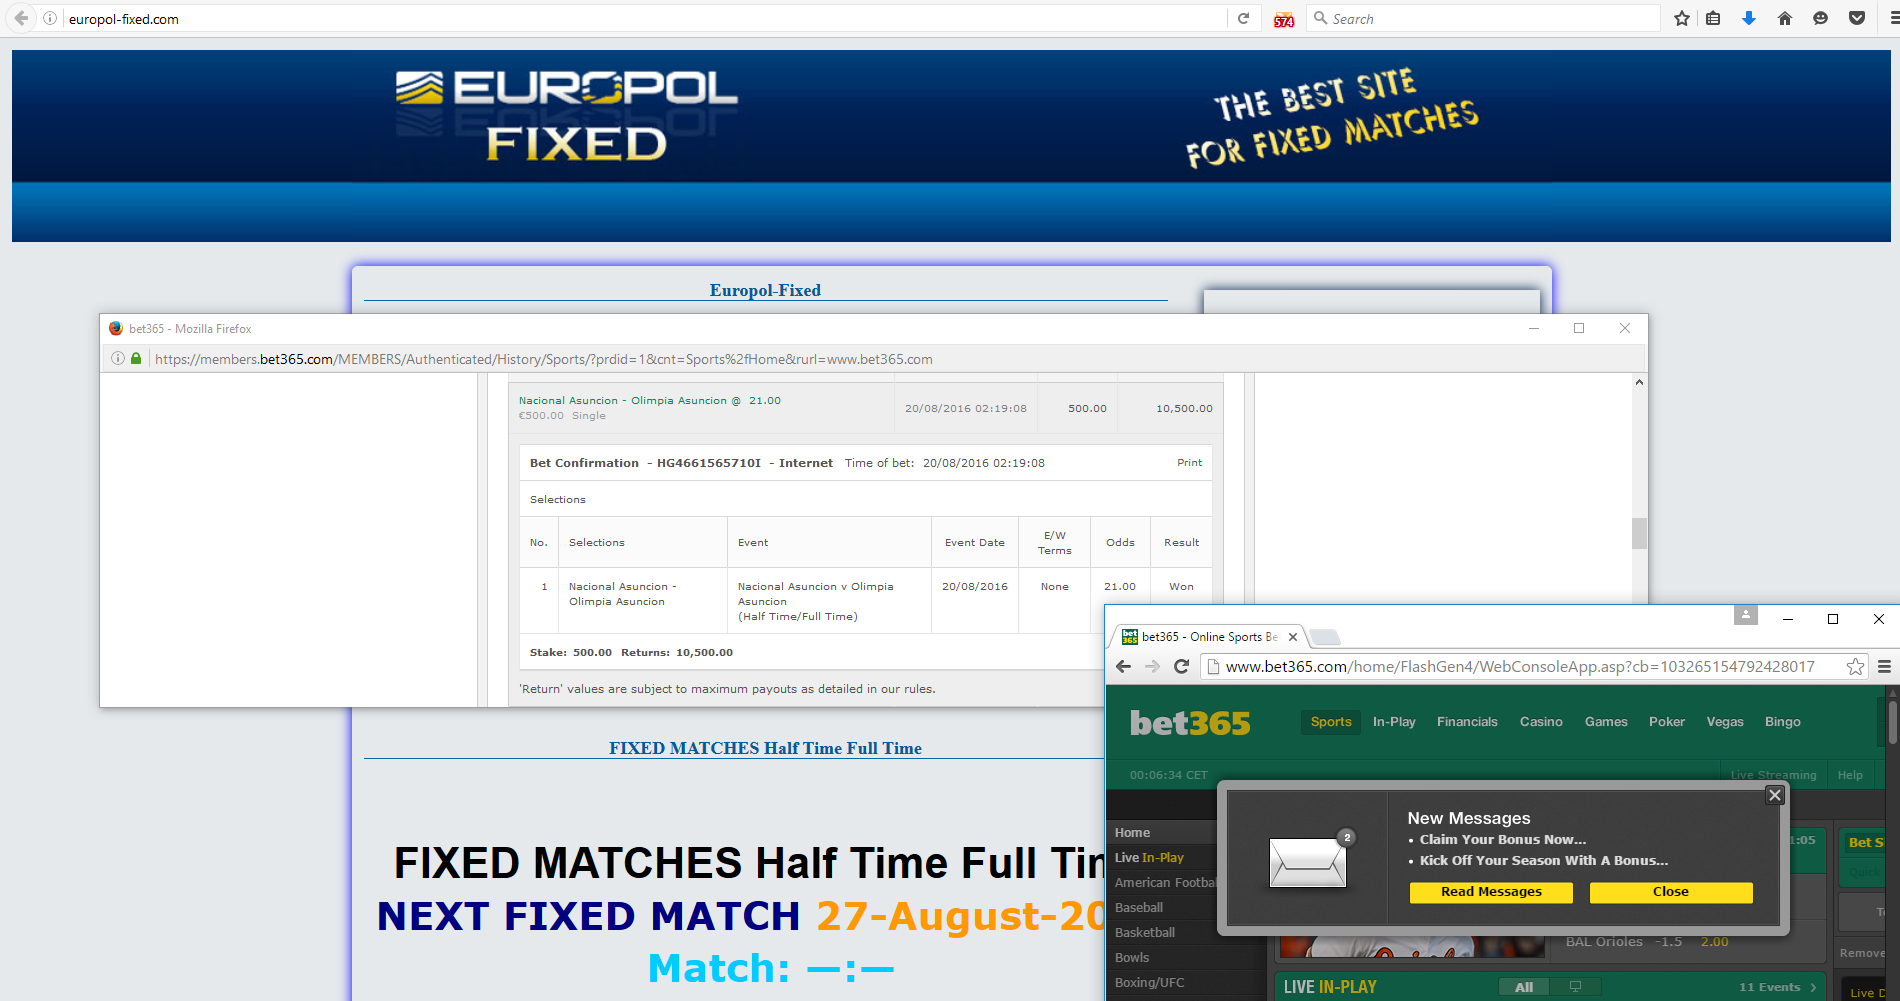 20-08-2016 Europol fixed matches